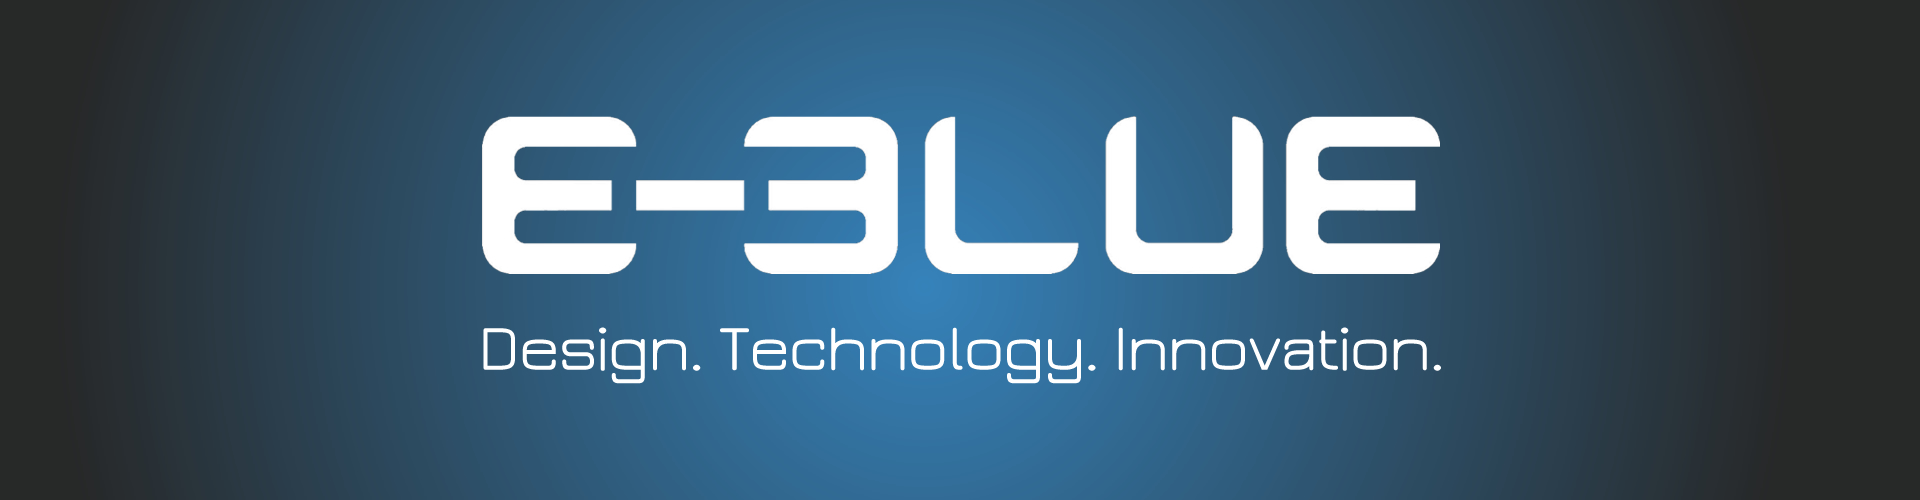 E-Blue - Дизайн. Технологии. Инновации.